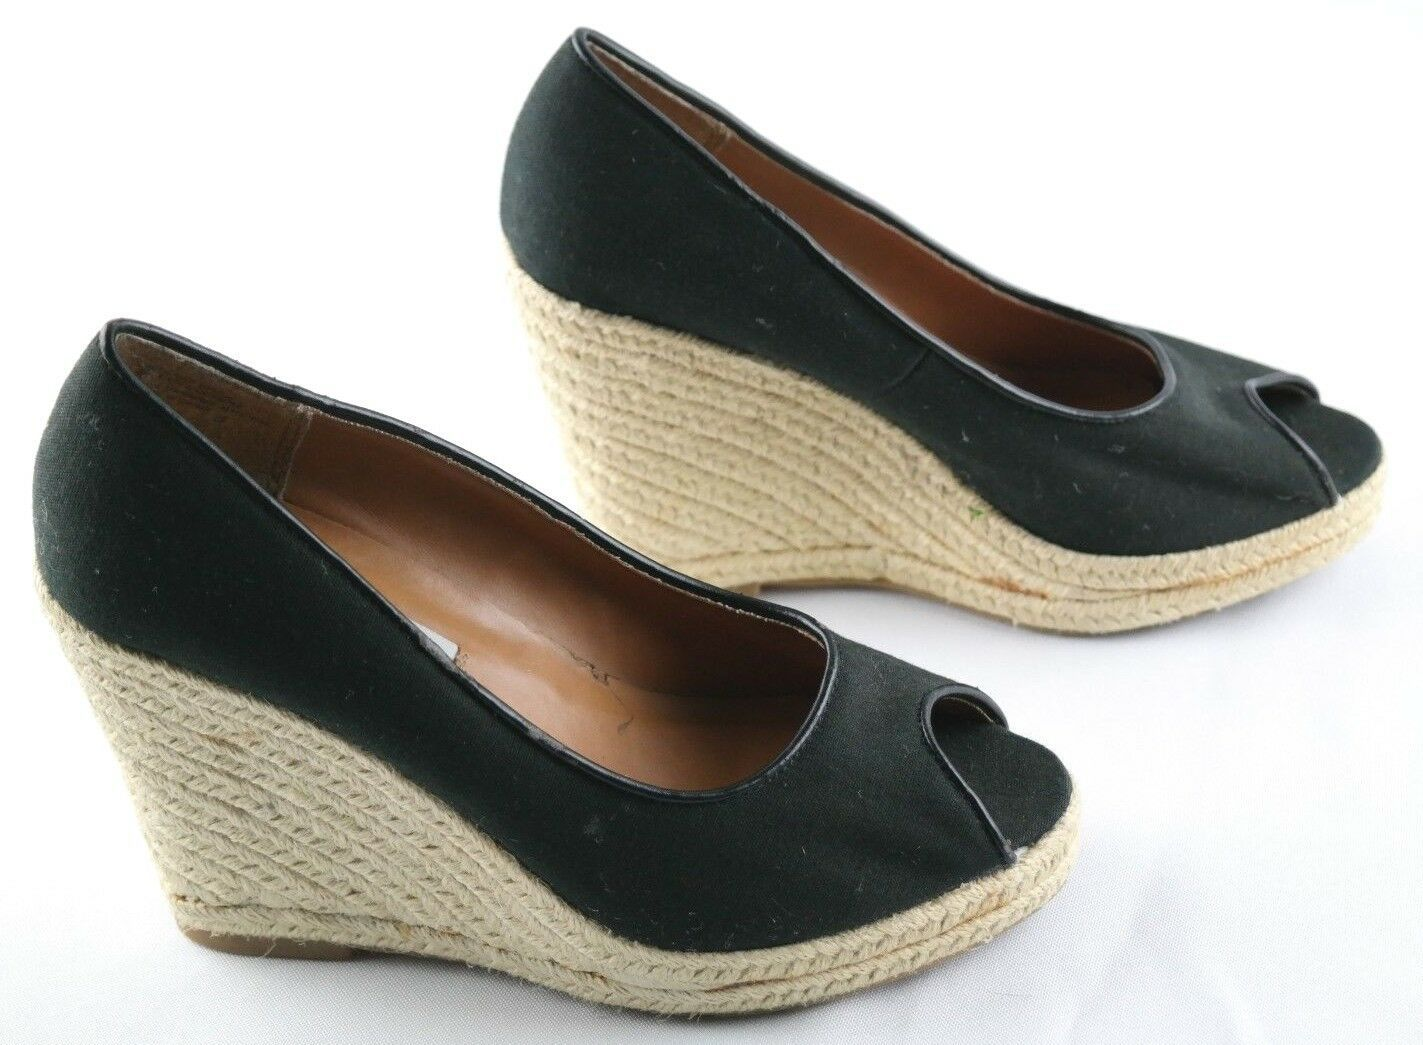 Steve Madden Peep Wedges Womens Size 6 Black Canvas Slip On High Heel Shoes